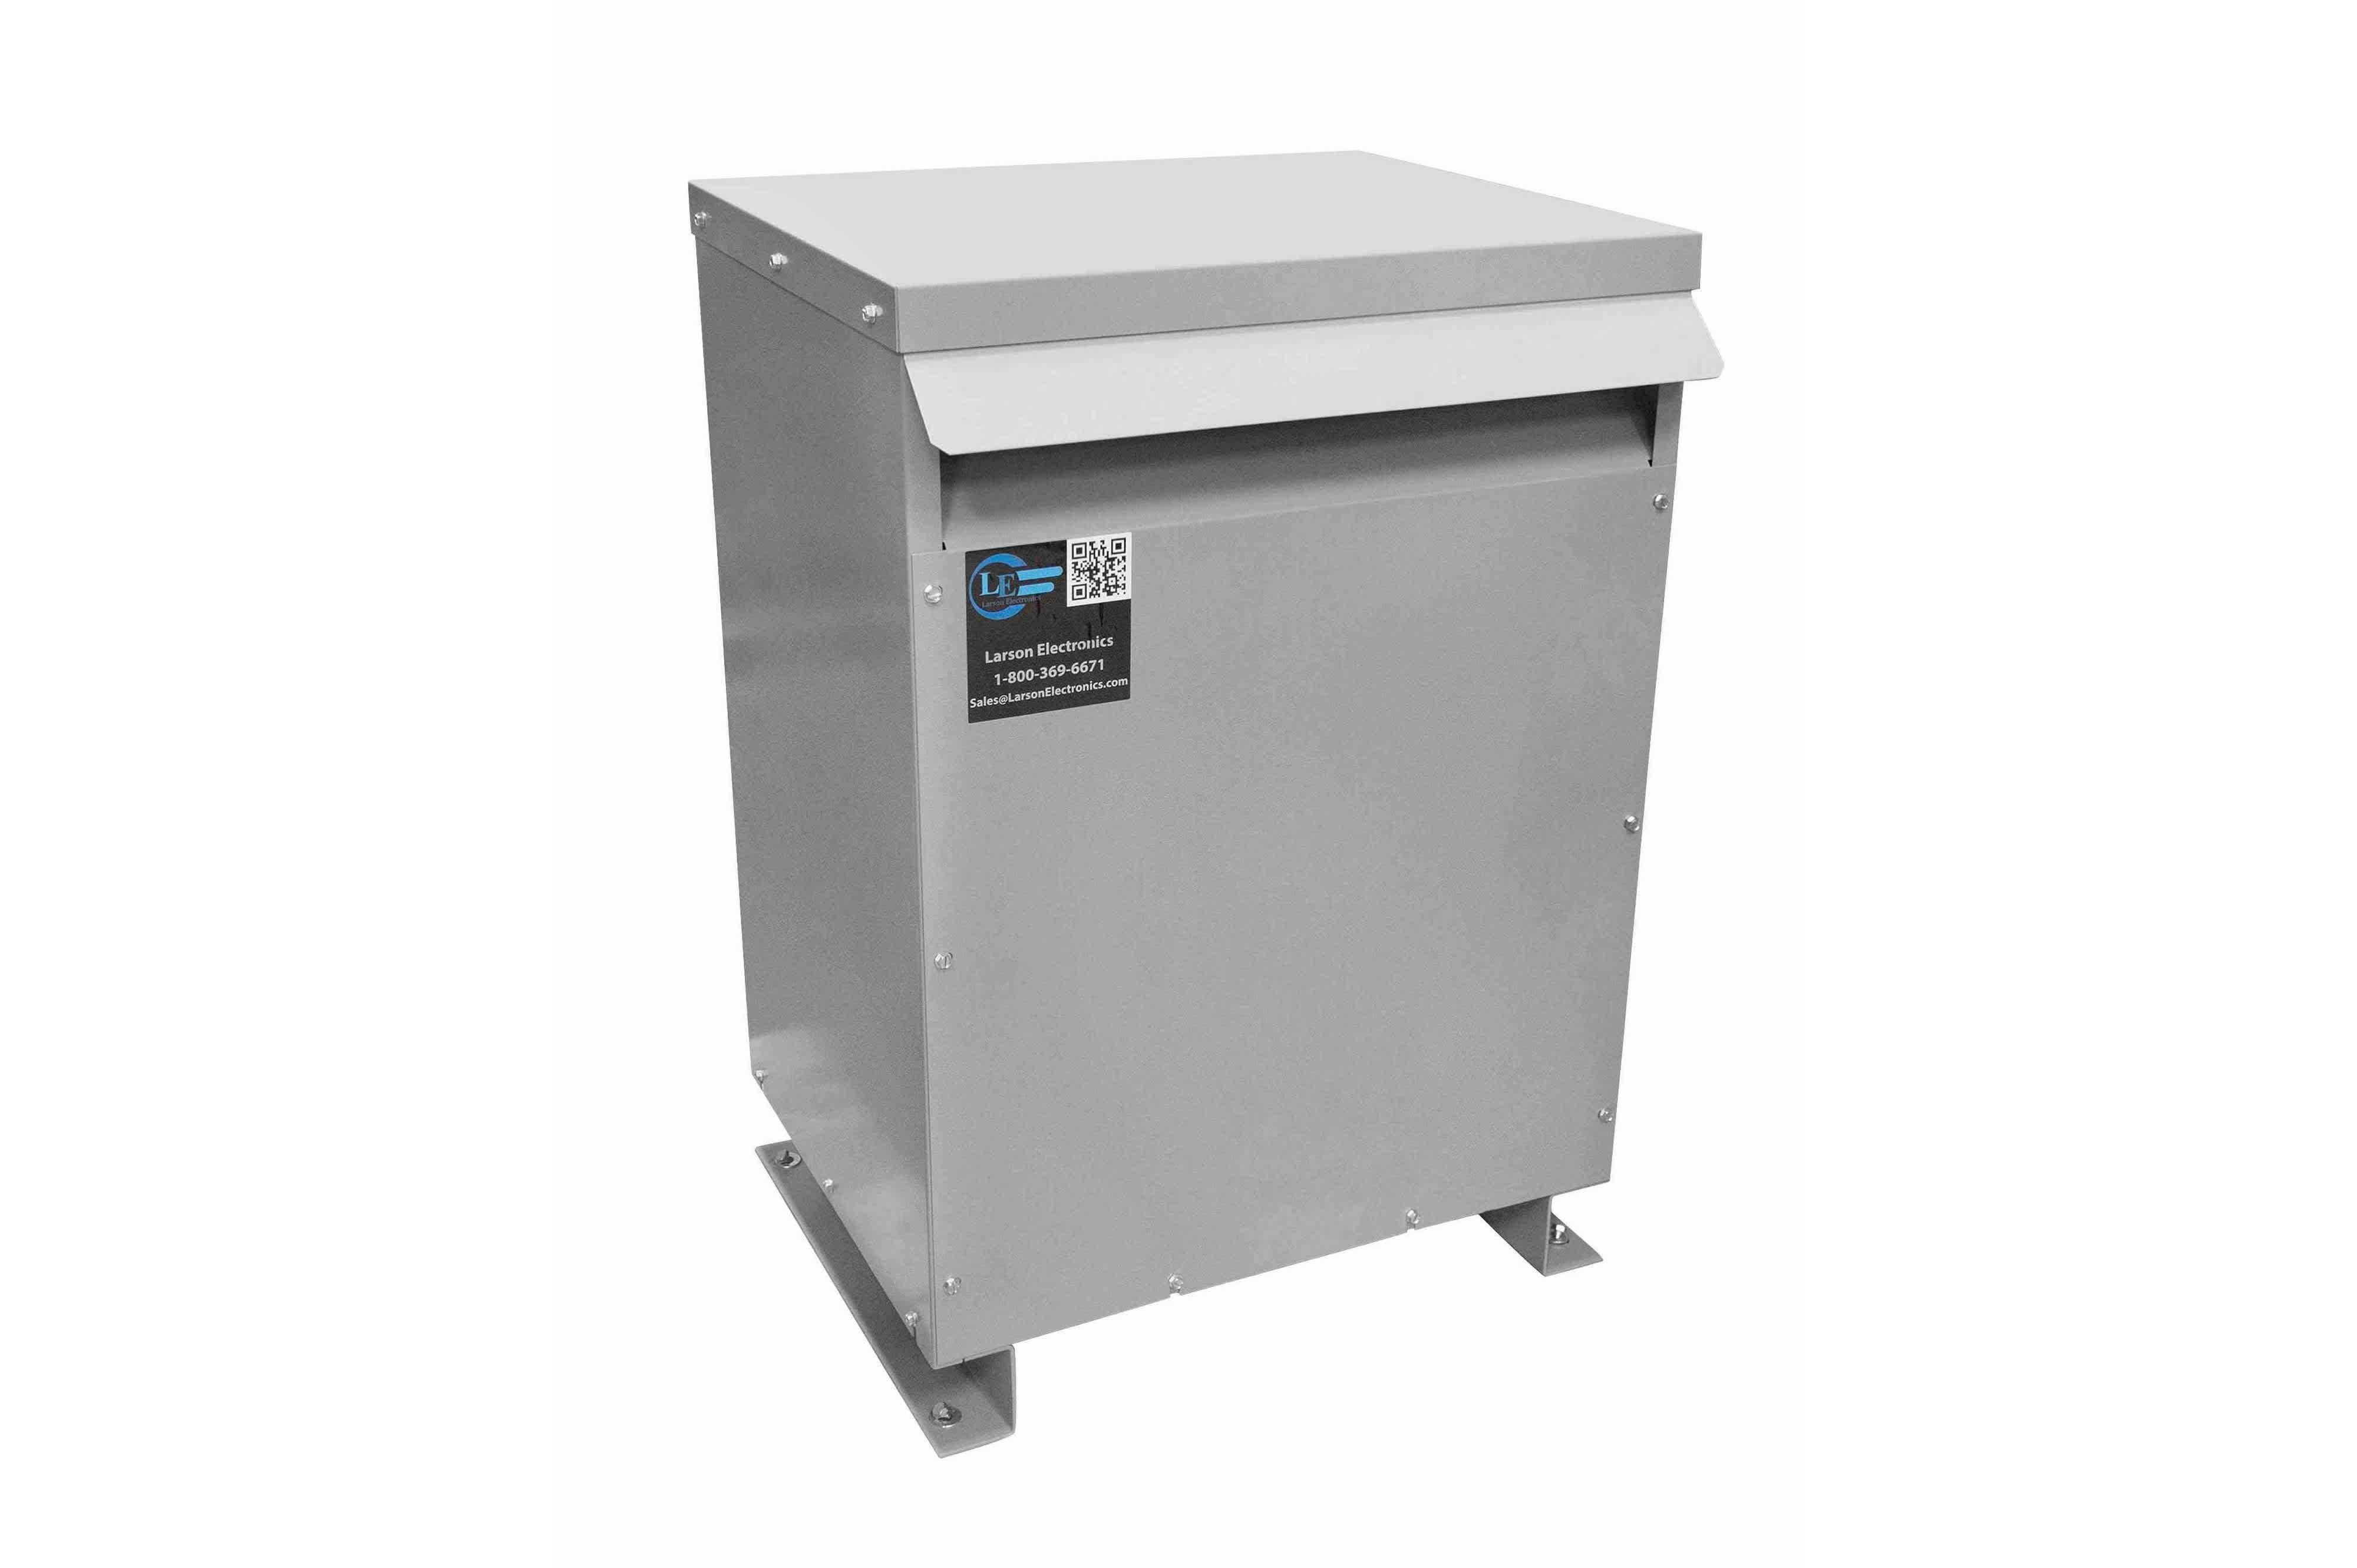 15 kVA 3PH Isolation Transformer, 600V Wye Primary, 240V/120 Delta Secondary, N3R, Ventilated, 60 Hz